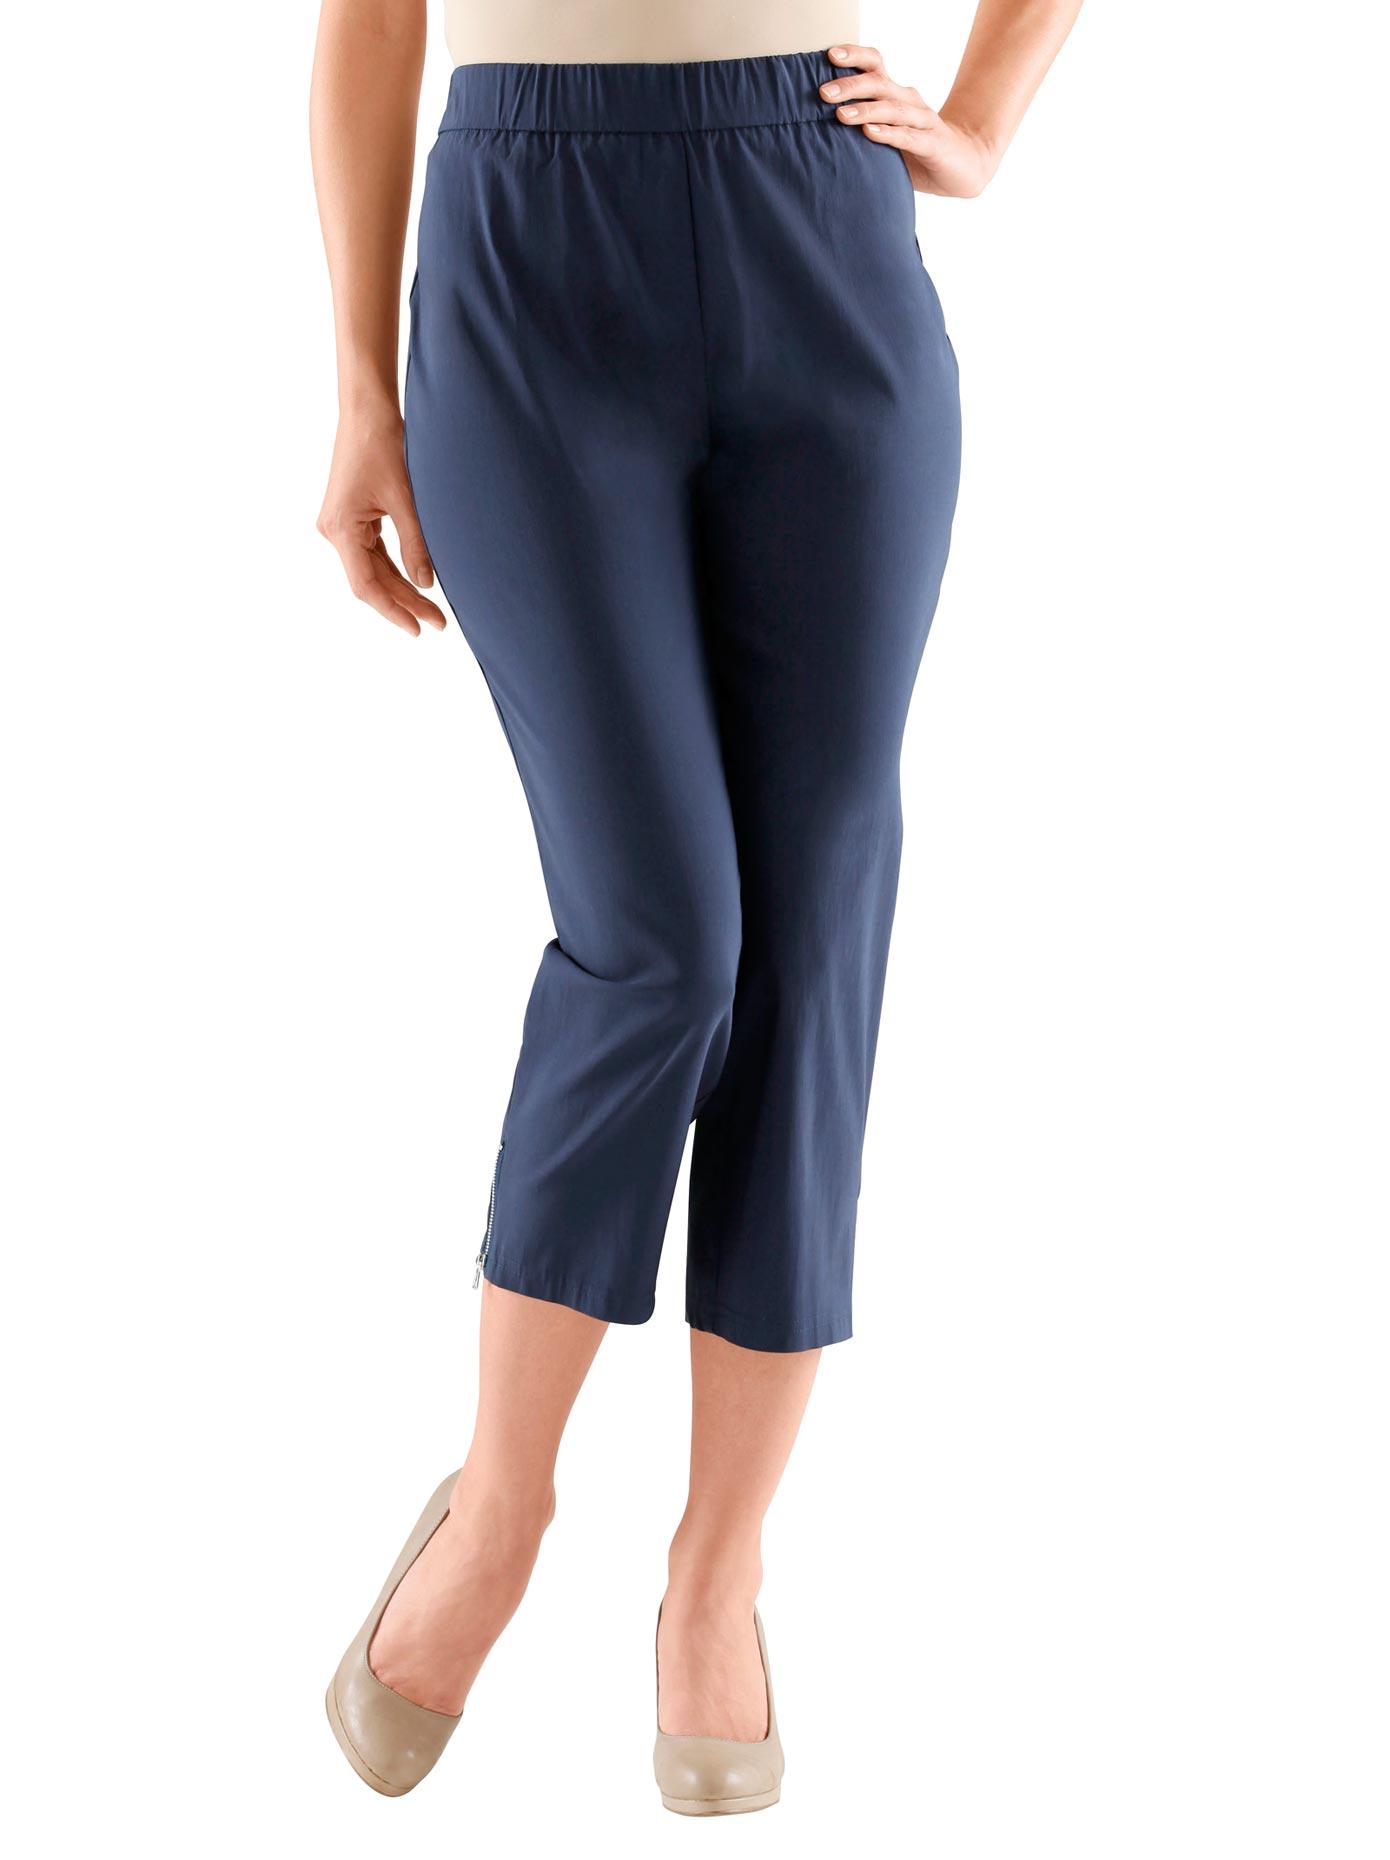 Adelina 7/8-Hose in aktueller Bengalin Qualität | Bekleidung > Hosen > 7/8-Hosen | Blau | Adelina